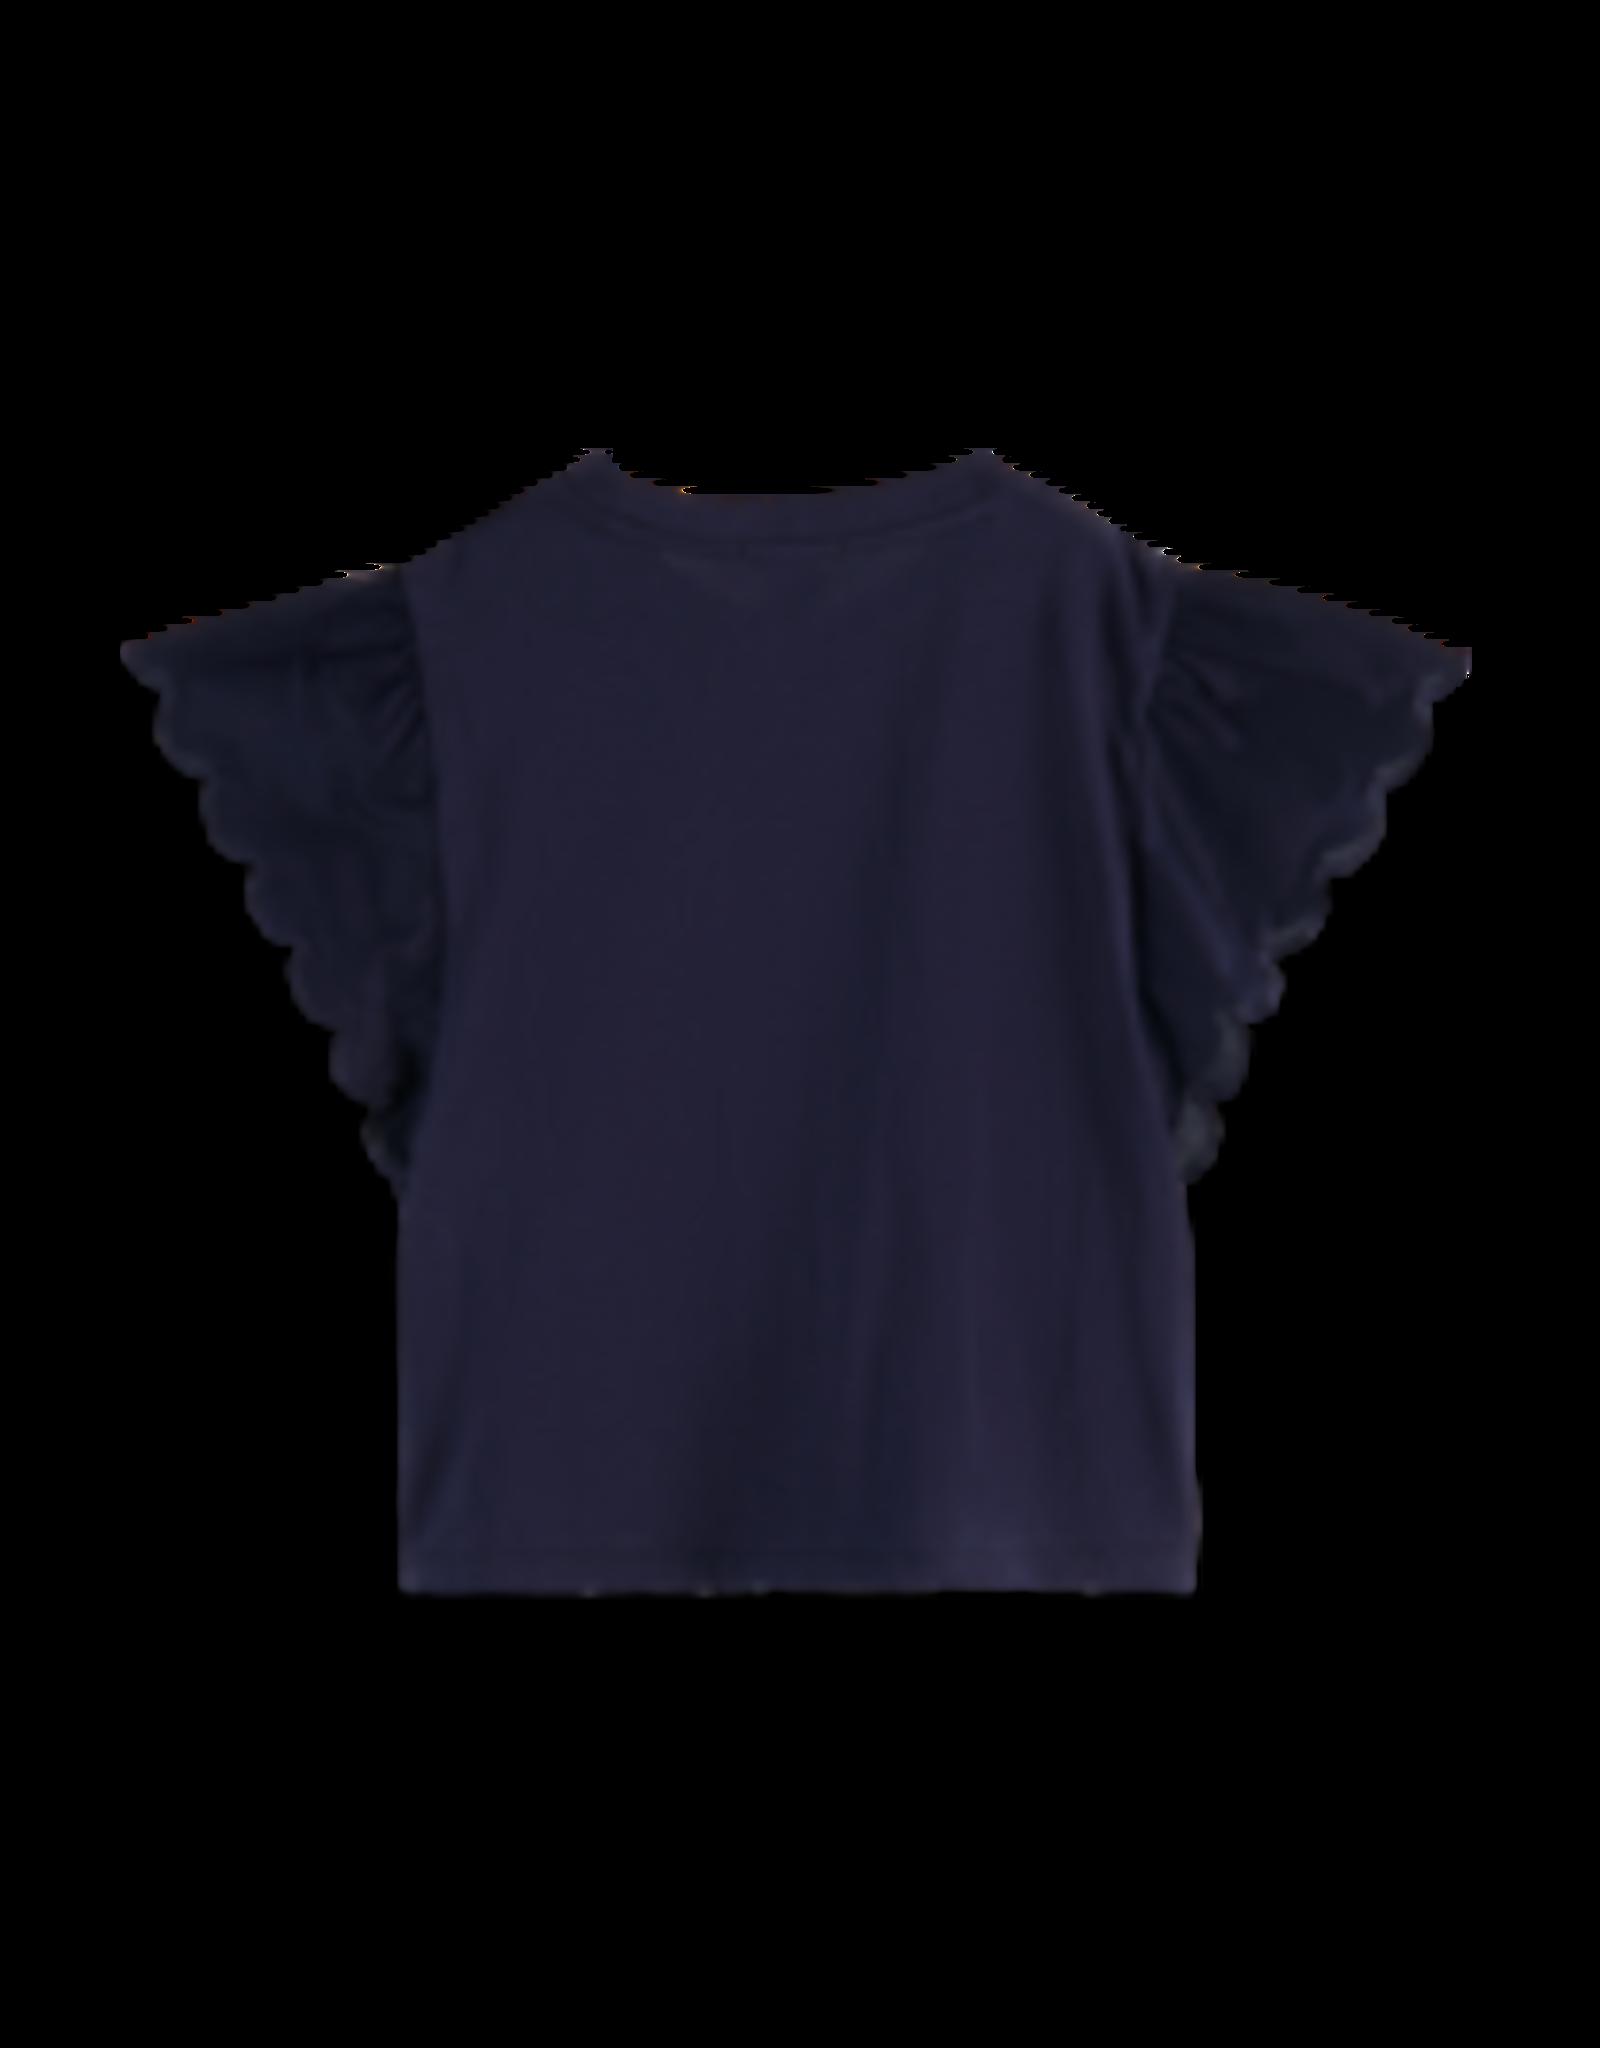 Scotch&Soda R'belle SS21 161299 T-shirt night